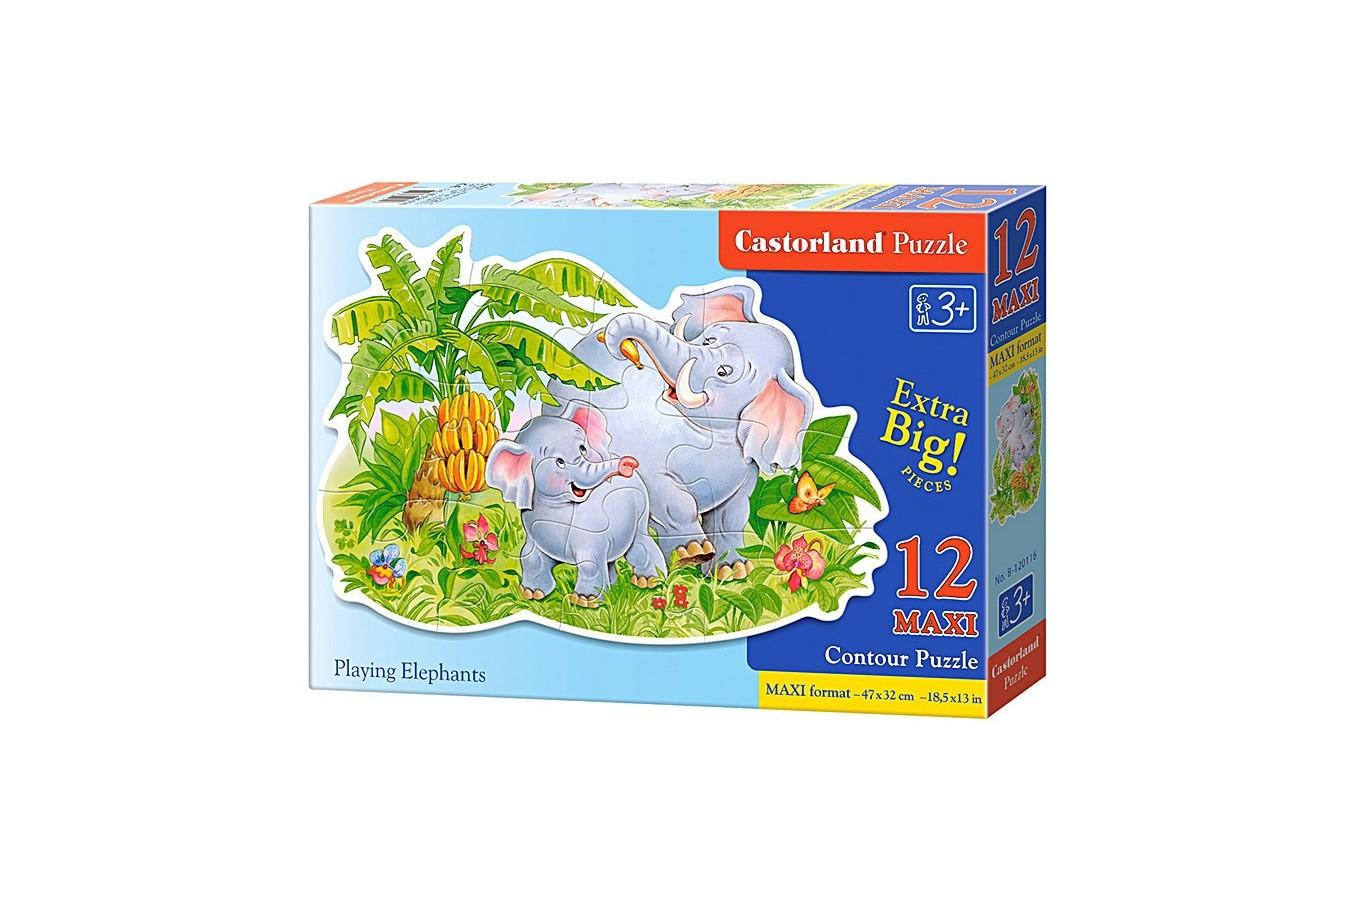 Puzzle Castorland Maxi - Playin Elefants, 12 Piese